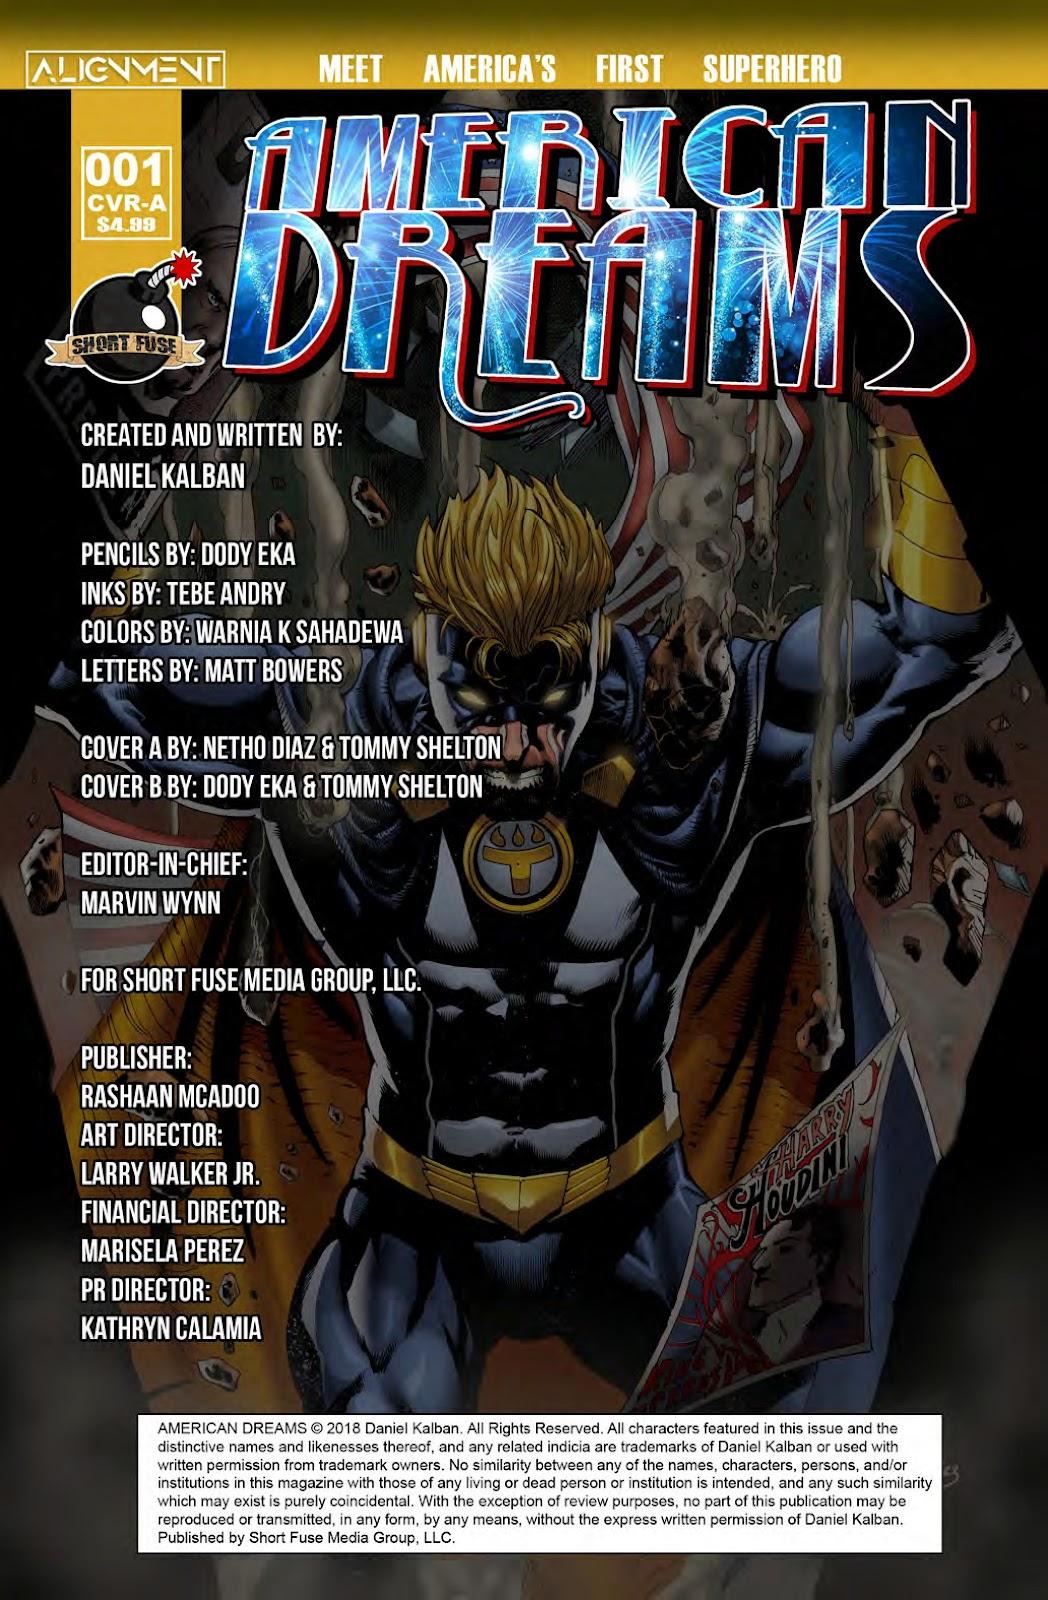 Read online American Dreams comic -  Issue #1 - 2